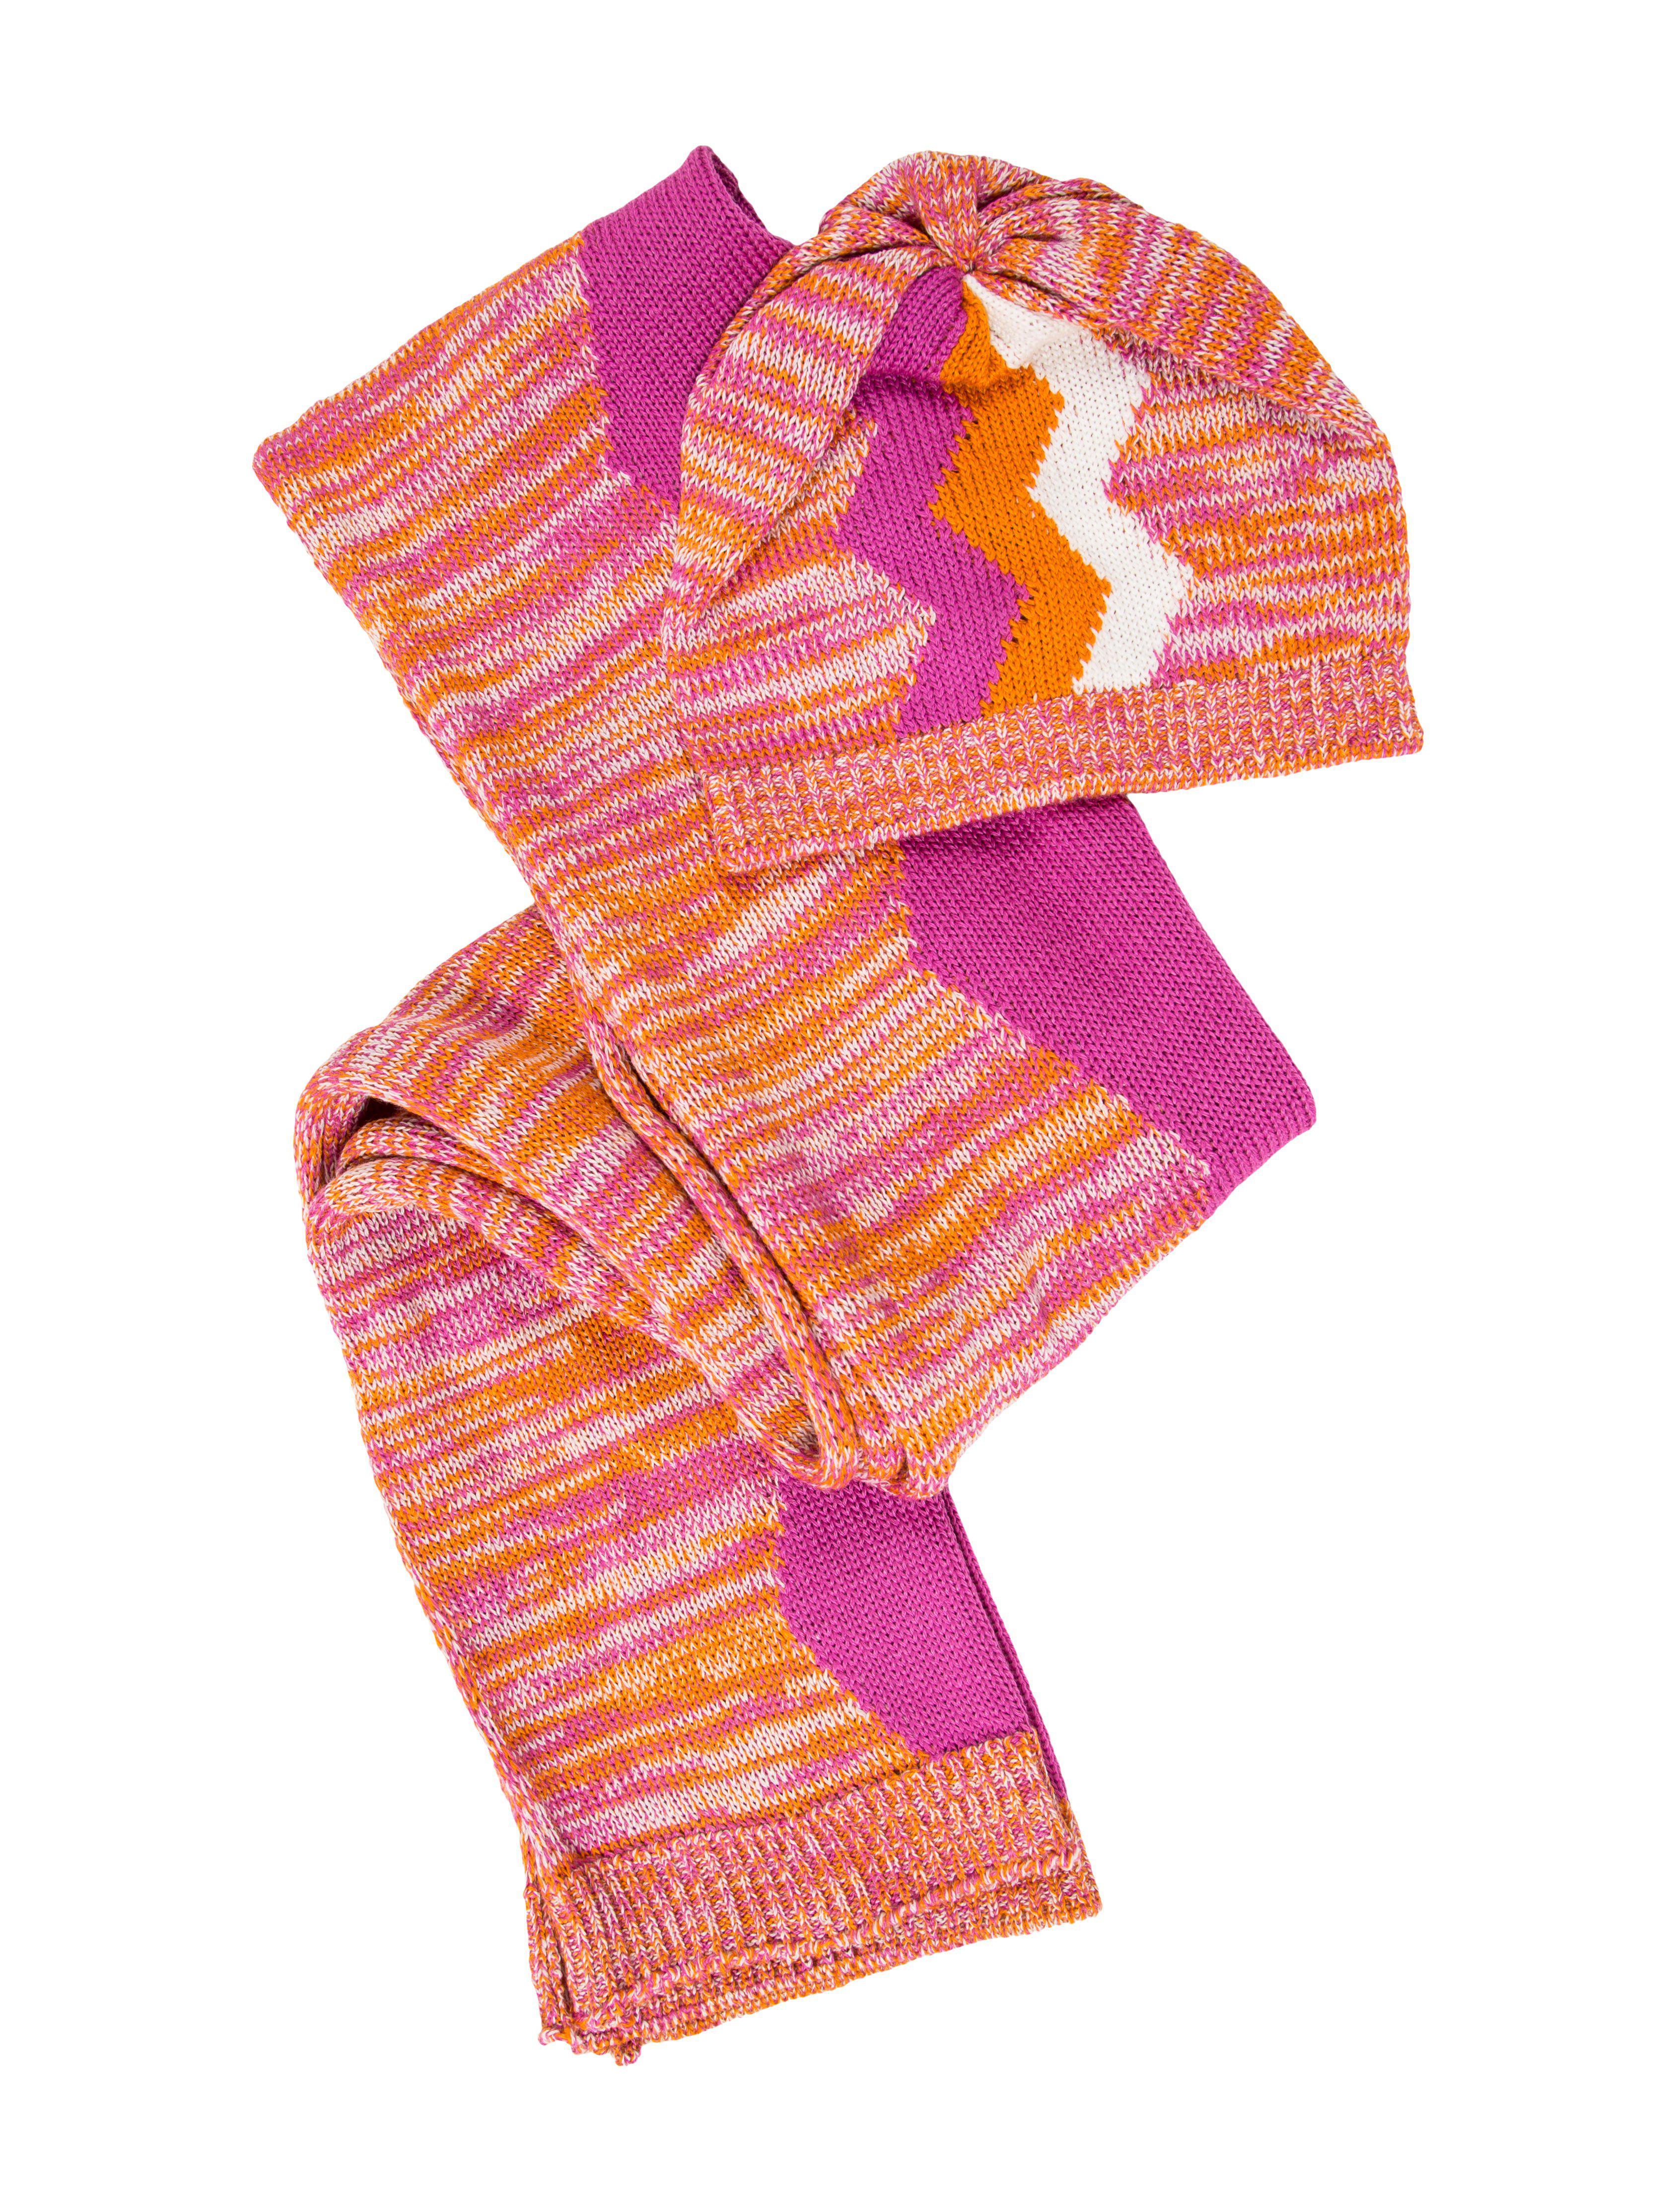 97ef8d95cf5 Lyst - Missoni Knit Hat   Scarf Set W  Tags in Pink